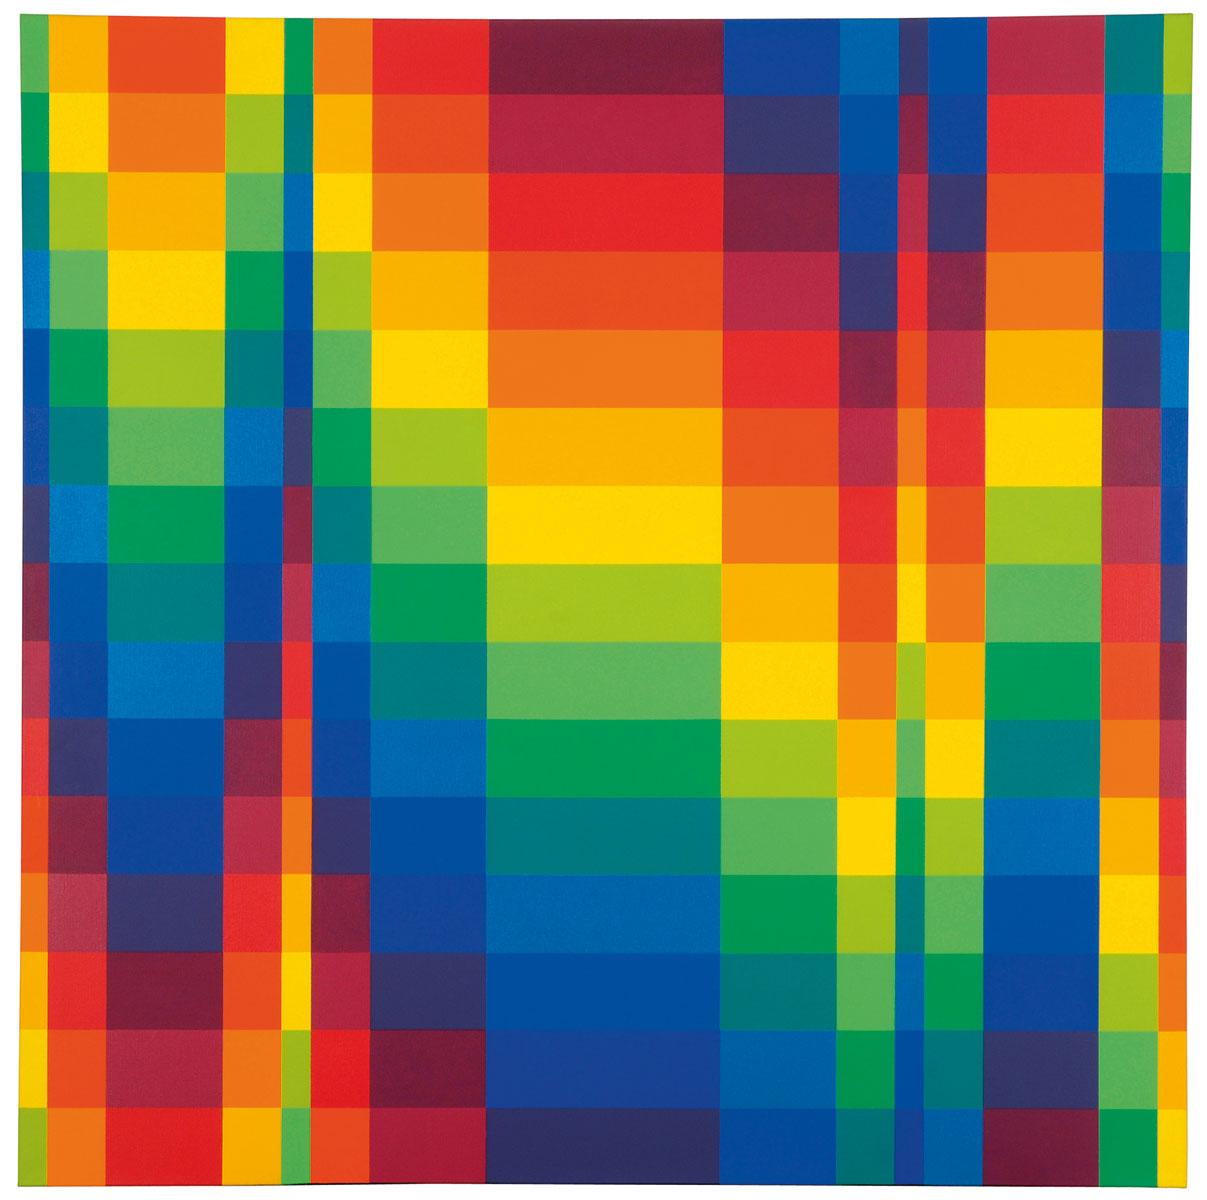 Richard Paul Lohse, Fünfzehn systematische Farbreihen in progressiven Horizontalgruppen, 1950/62, 150×150 cm, Museum für Konkrete Kunst, Ingolstadt